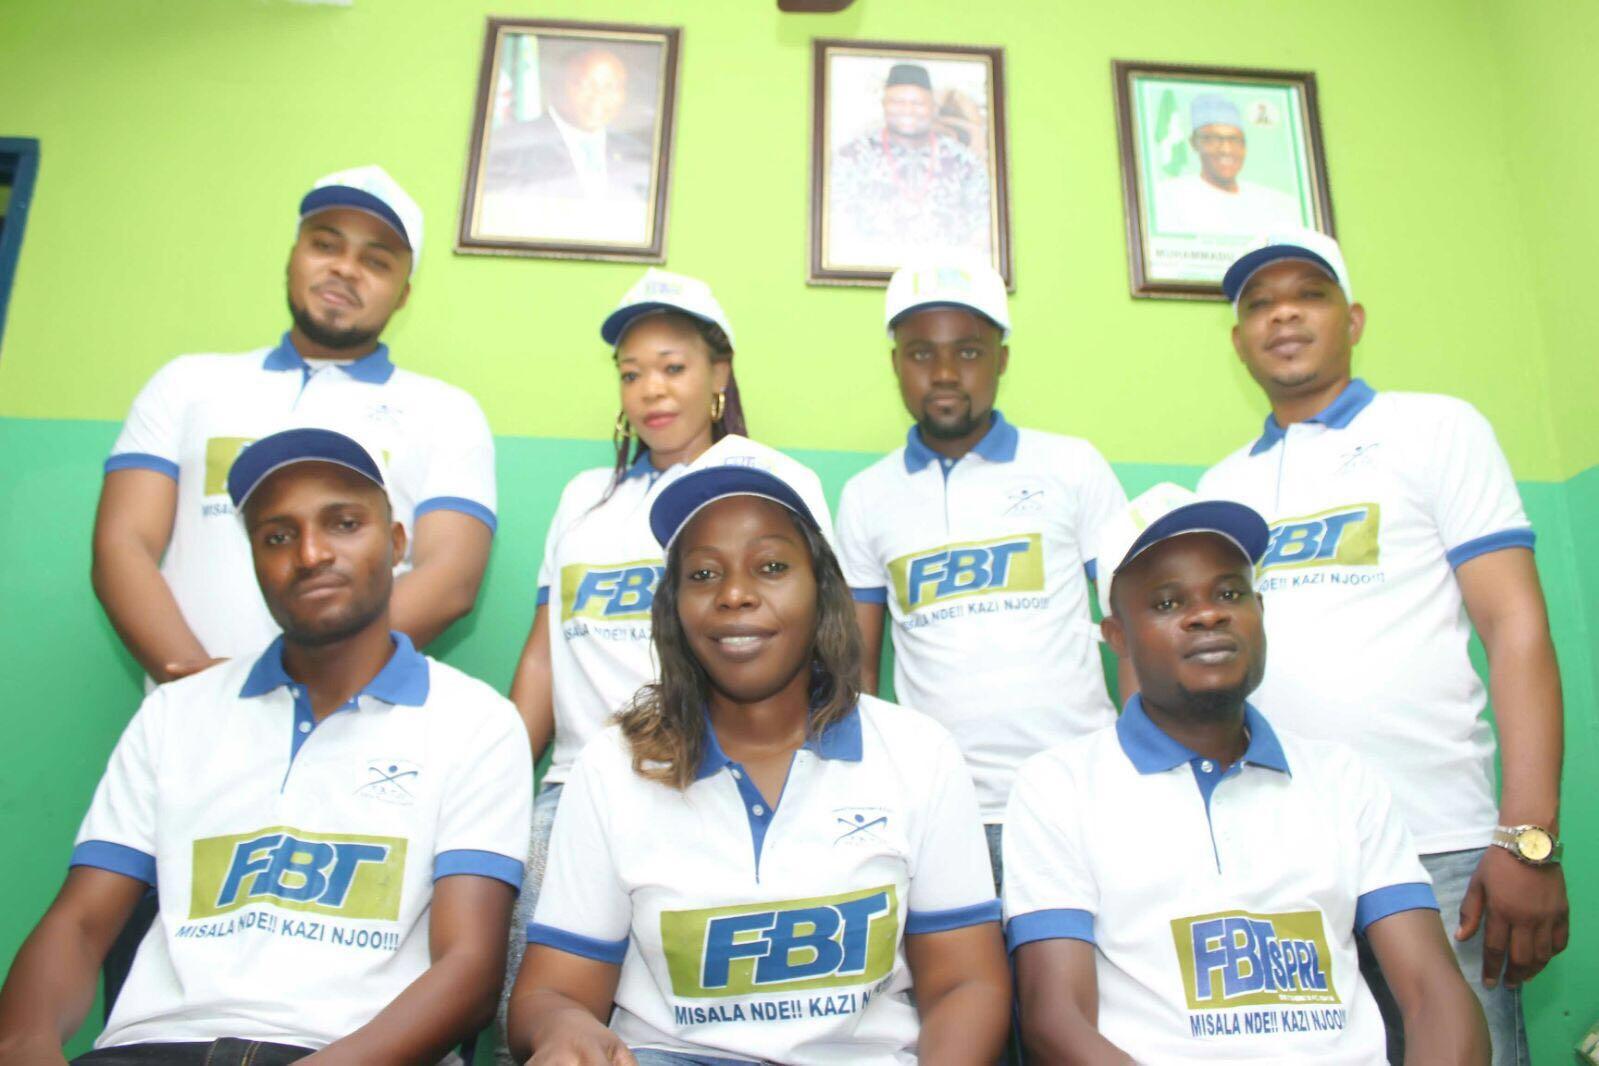 FBT Nigeria 5